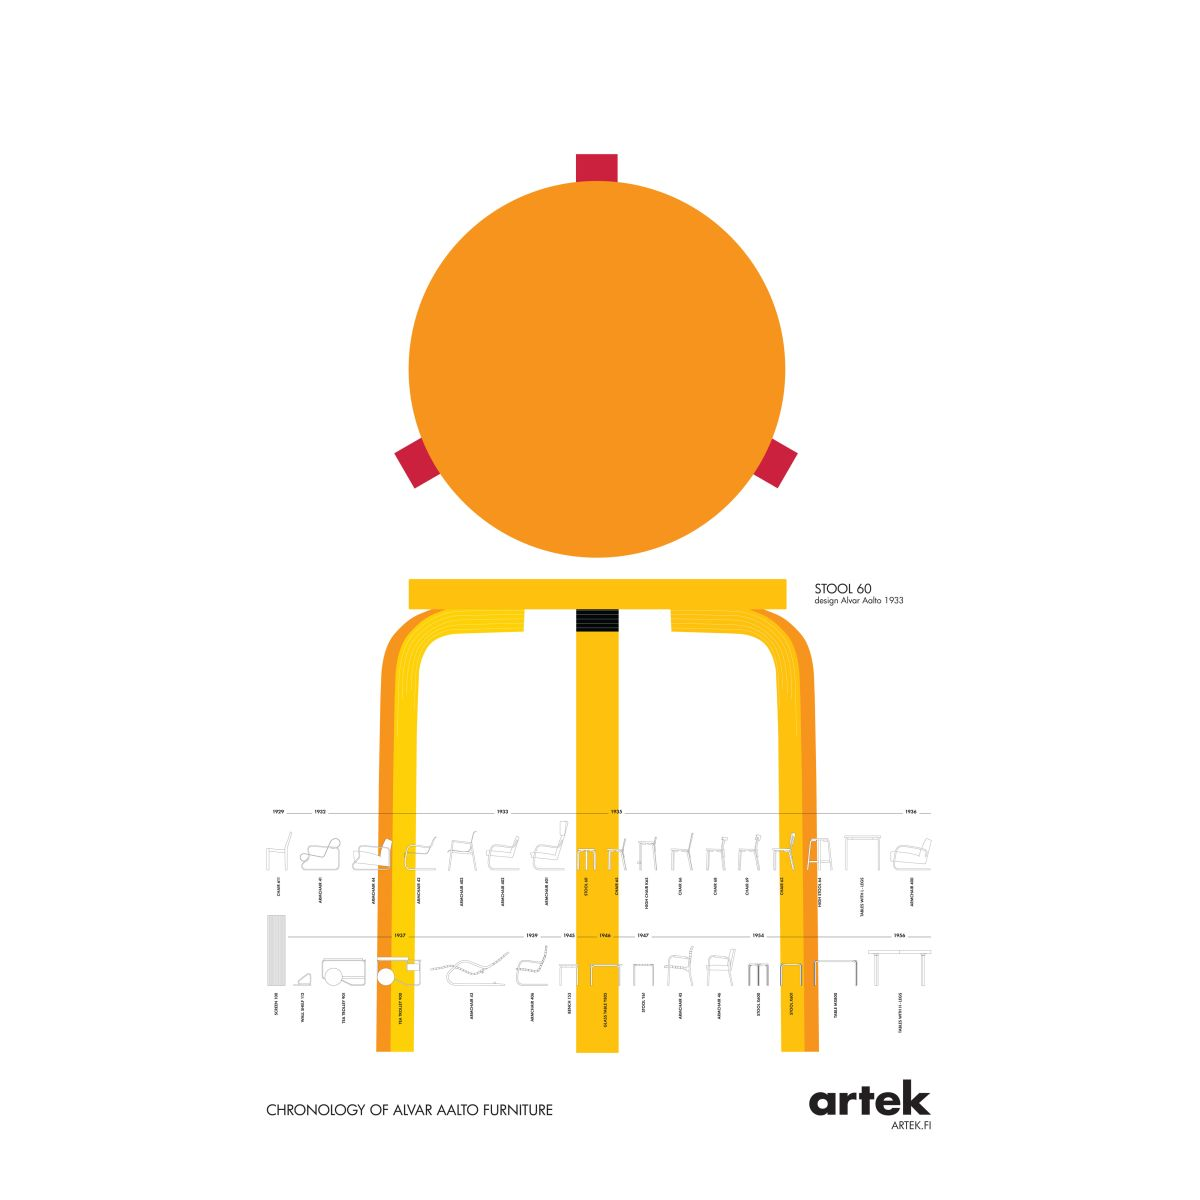 Aalto-Chronology-Poster-1848507_Web-1977555